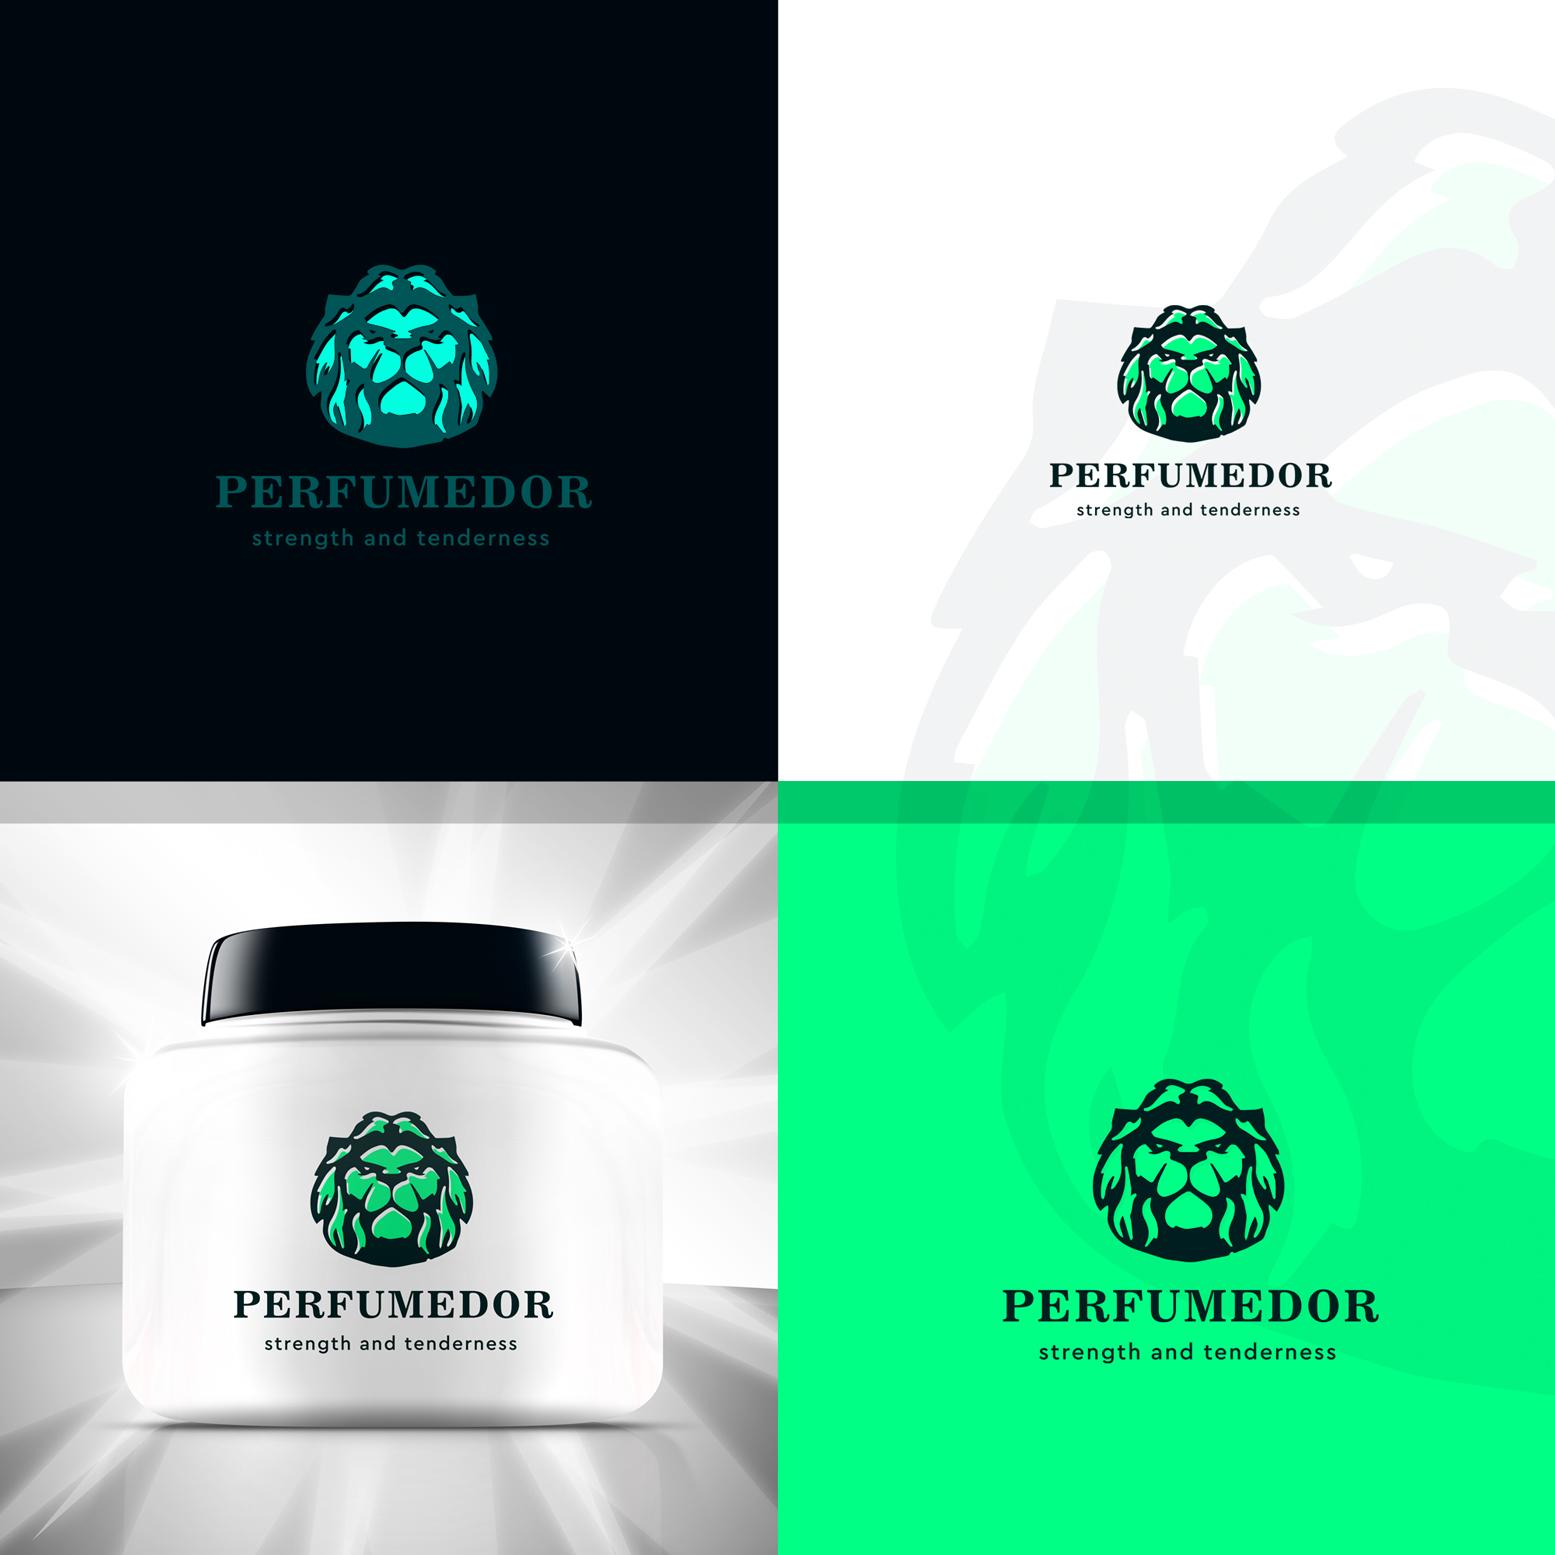 Логотип для интернет-магазина парфюмерии фото f_8665b44d016b5856.jpg